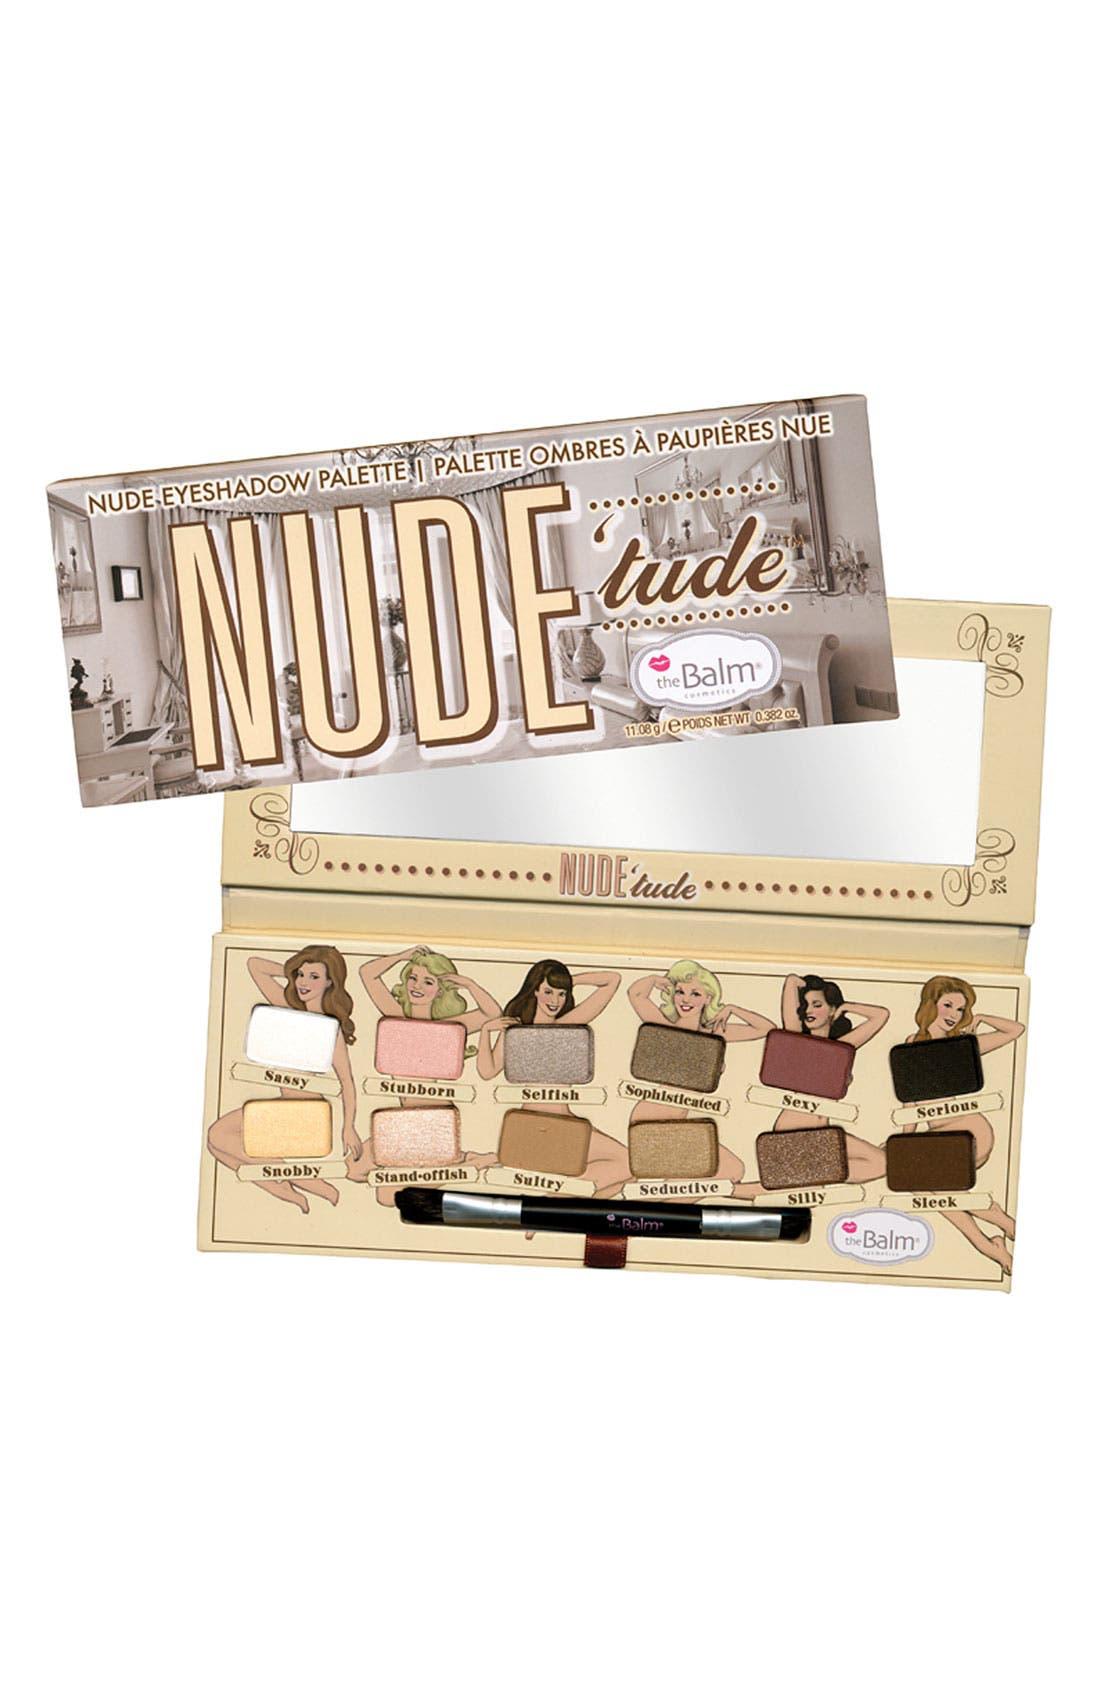 'Nude'tude<sup>®</sup> - Naughty' Eyeshadow Palette,                             Main thumbnail 1, color,                             250